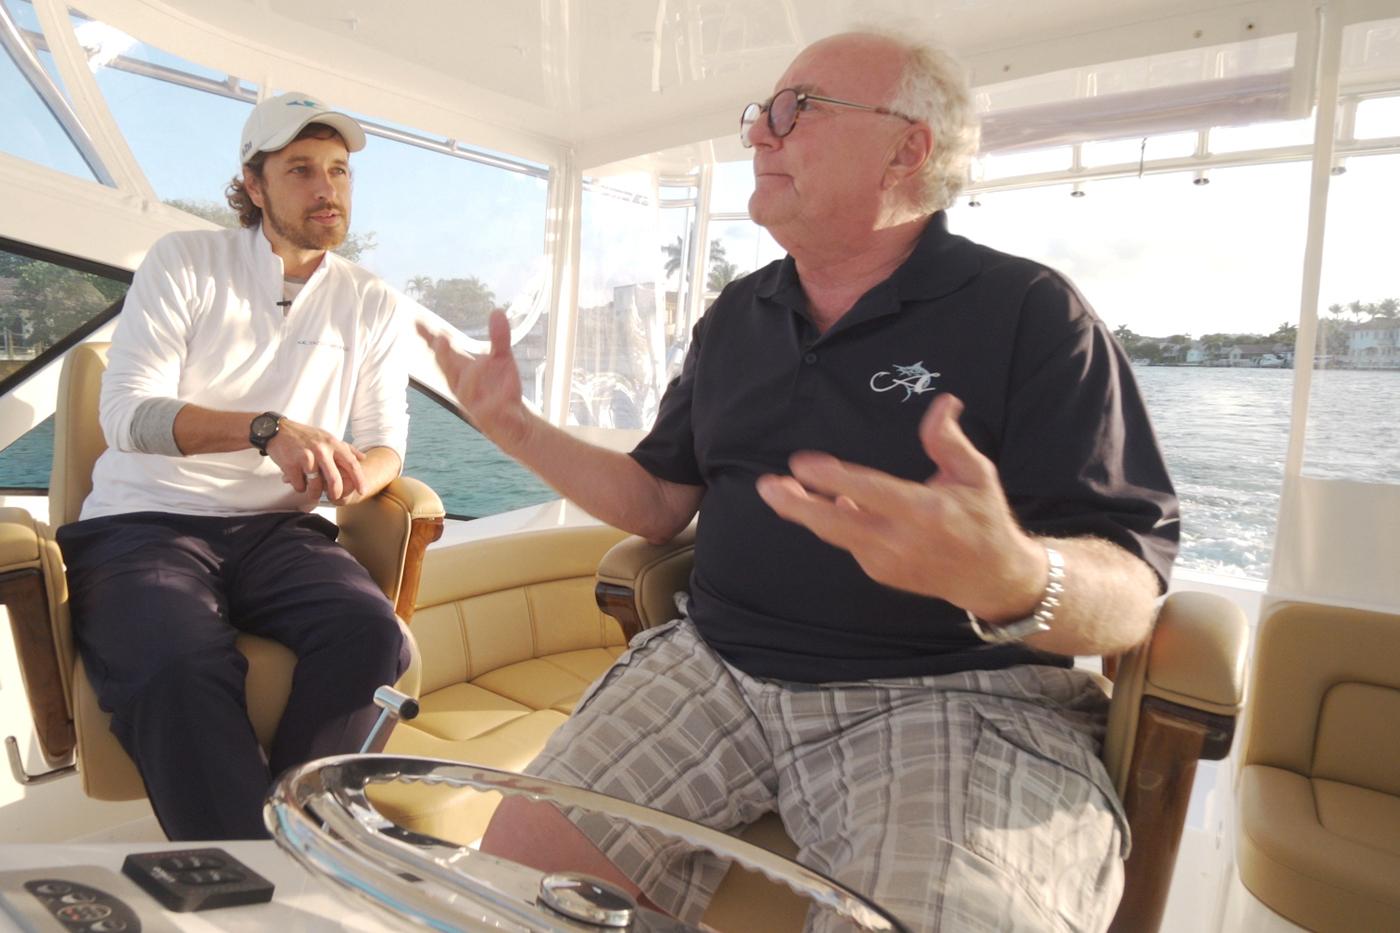 Ryan McVinney and Chuck Sealy at the helm of an Albemarle 41 Express Custom Carolina Edition Fiashing Boat